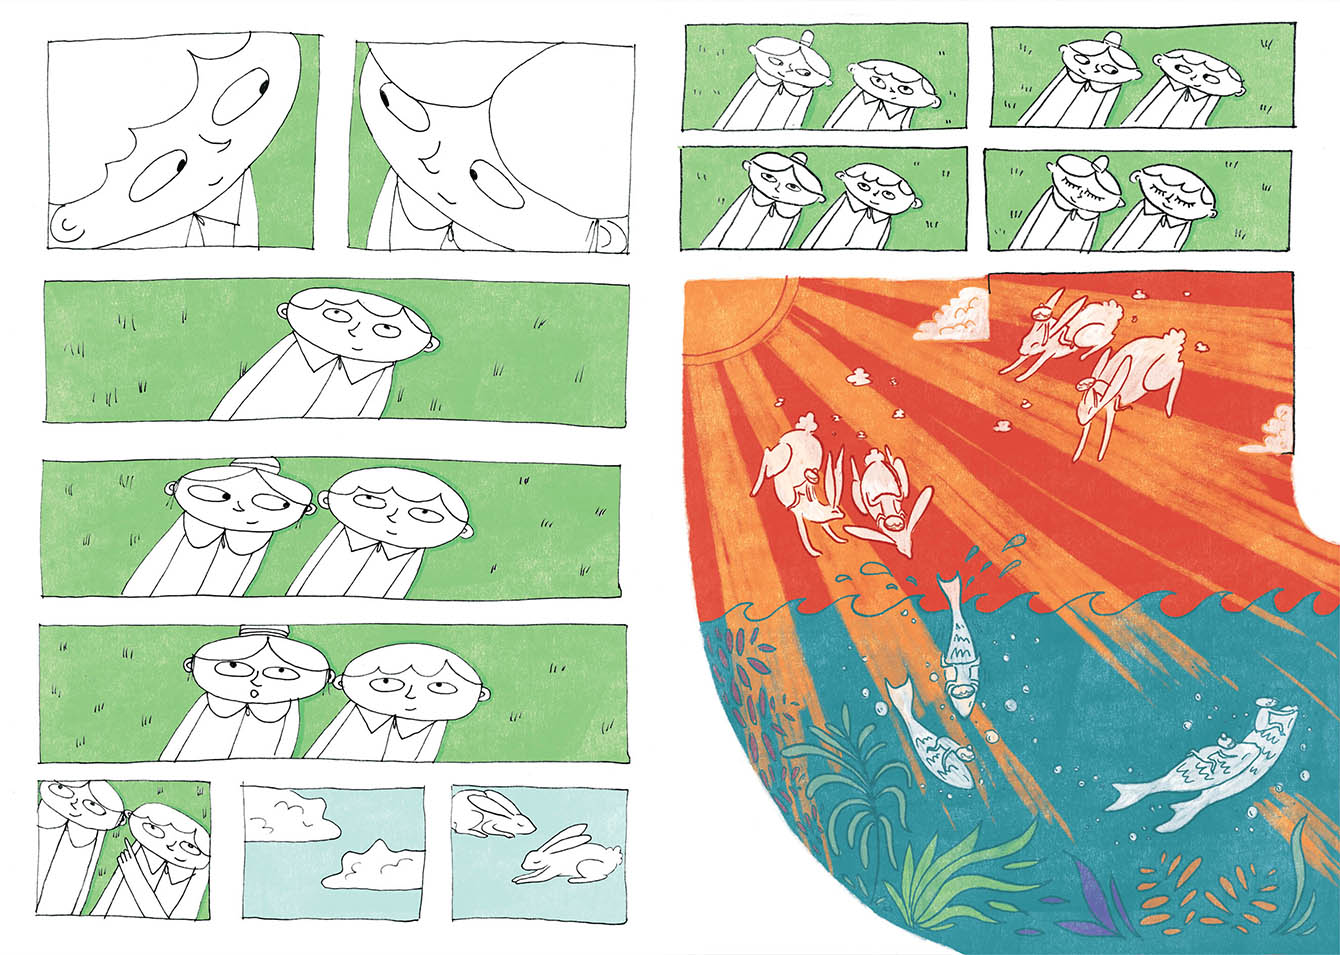 Dagdrømme Page 2